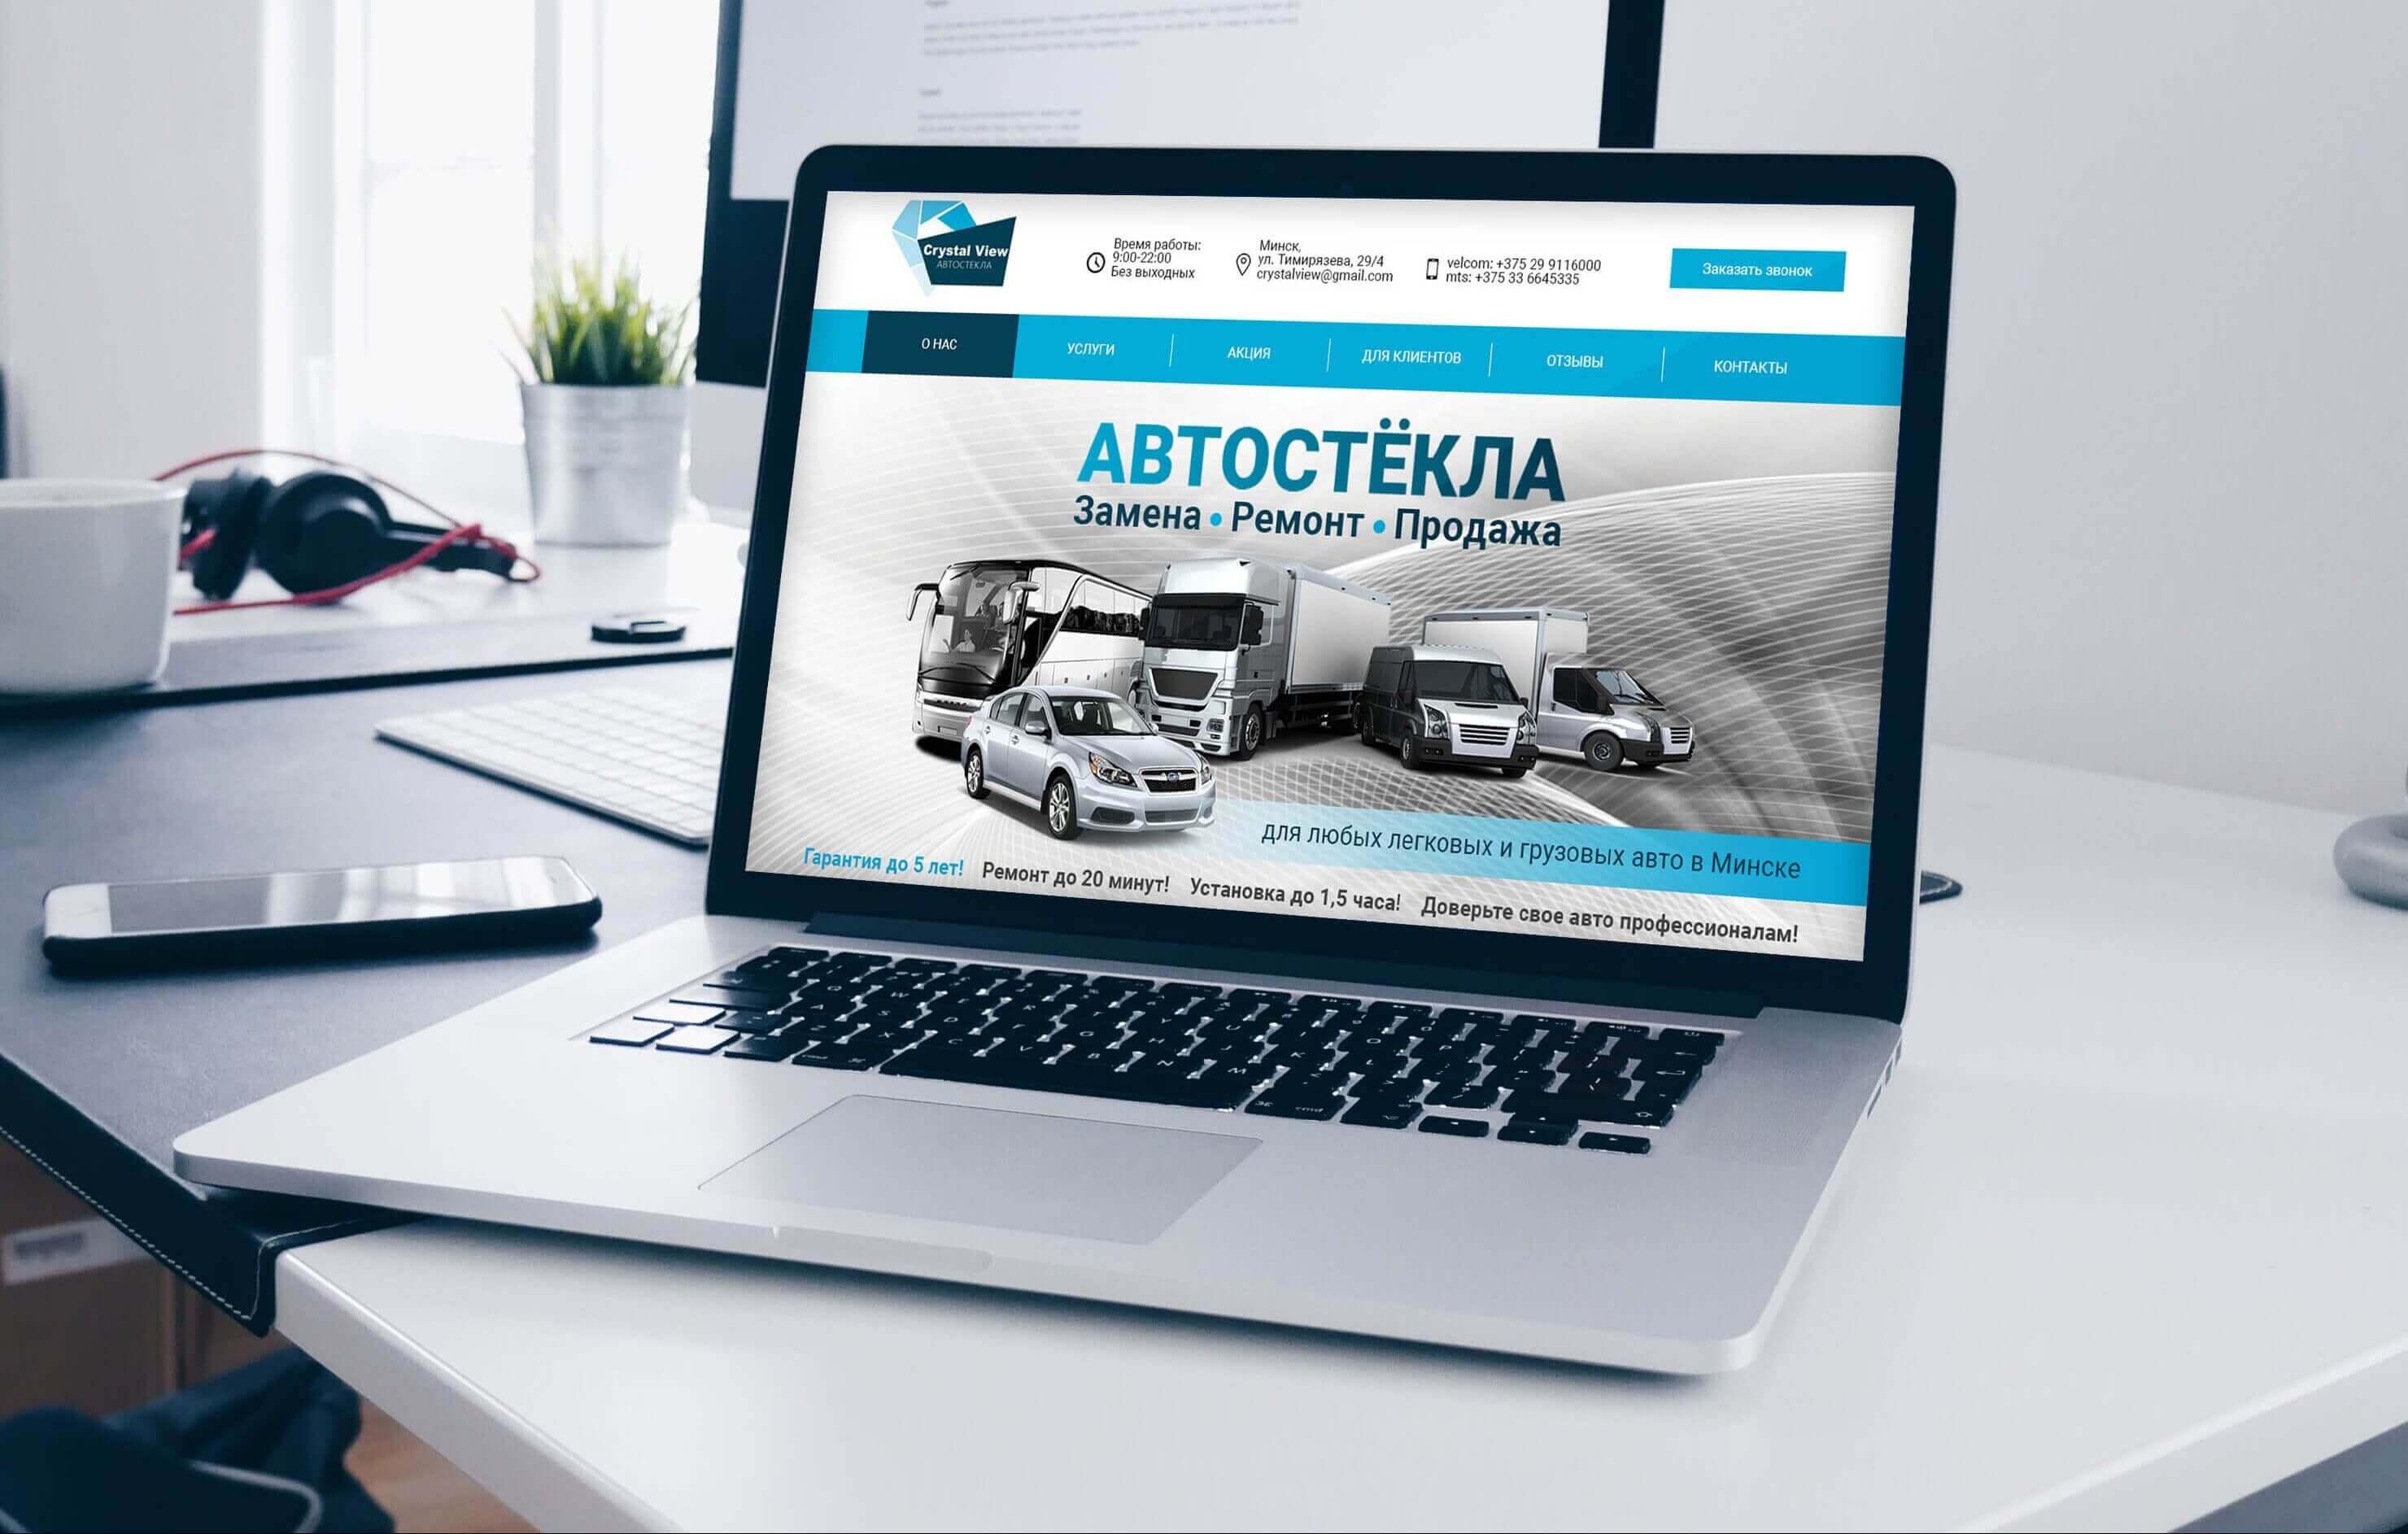 Cайт СТО по замене и ремонту автостекол crv.by. Дизайн. Разработка.